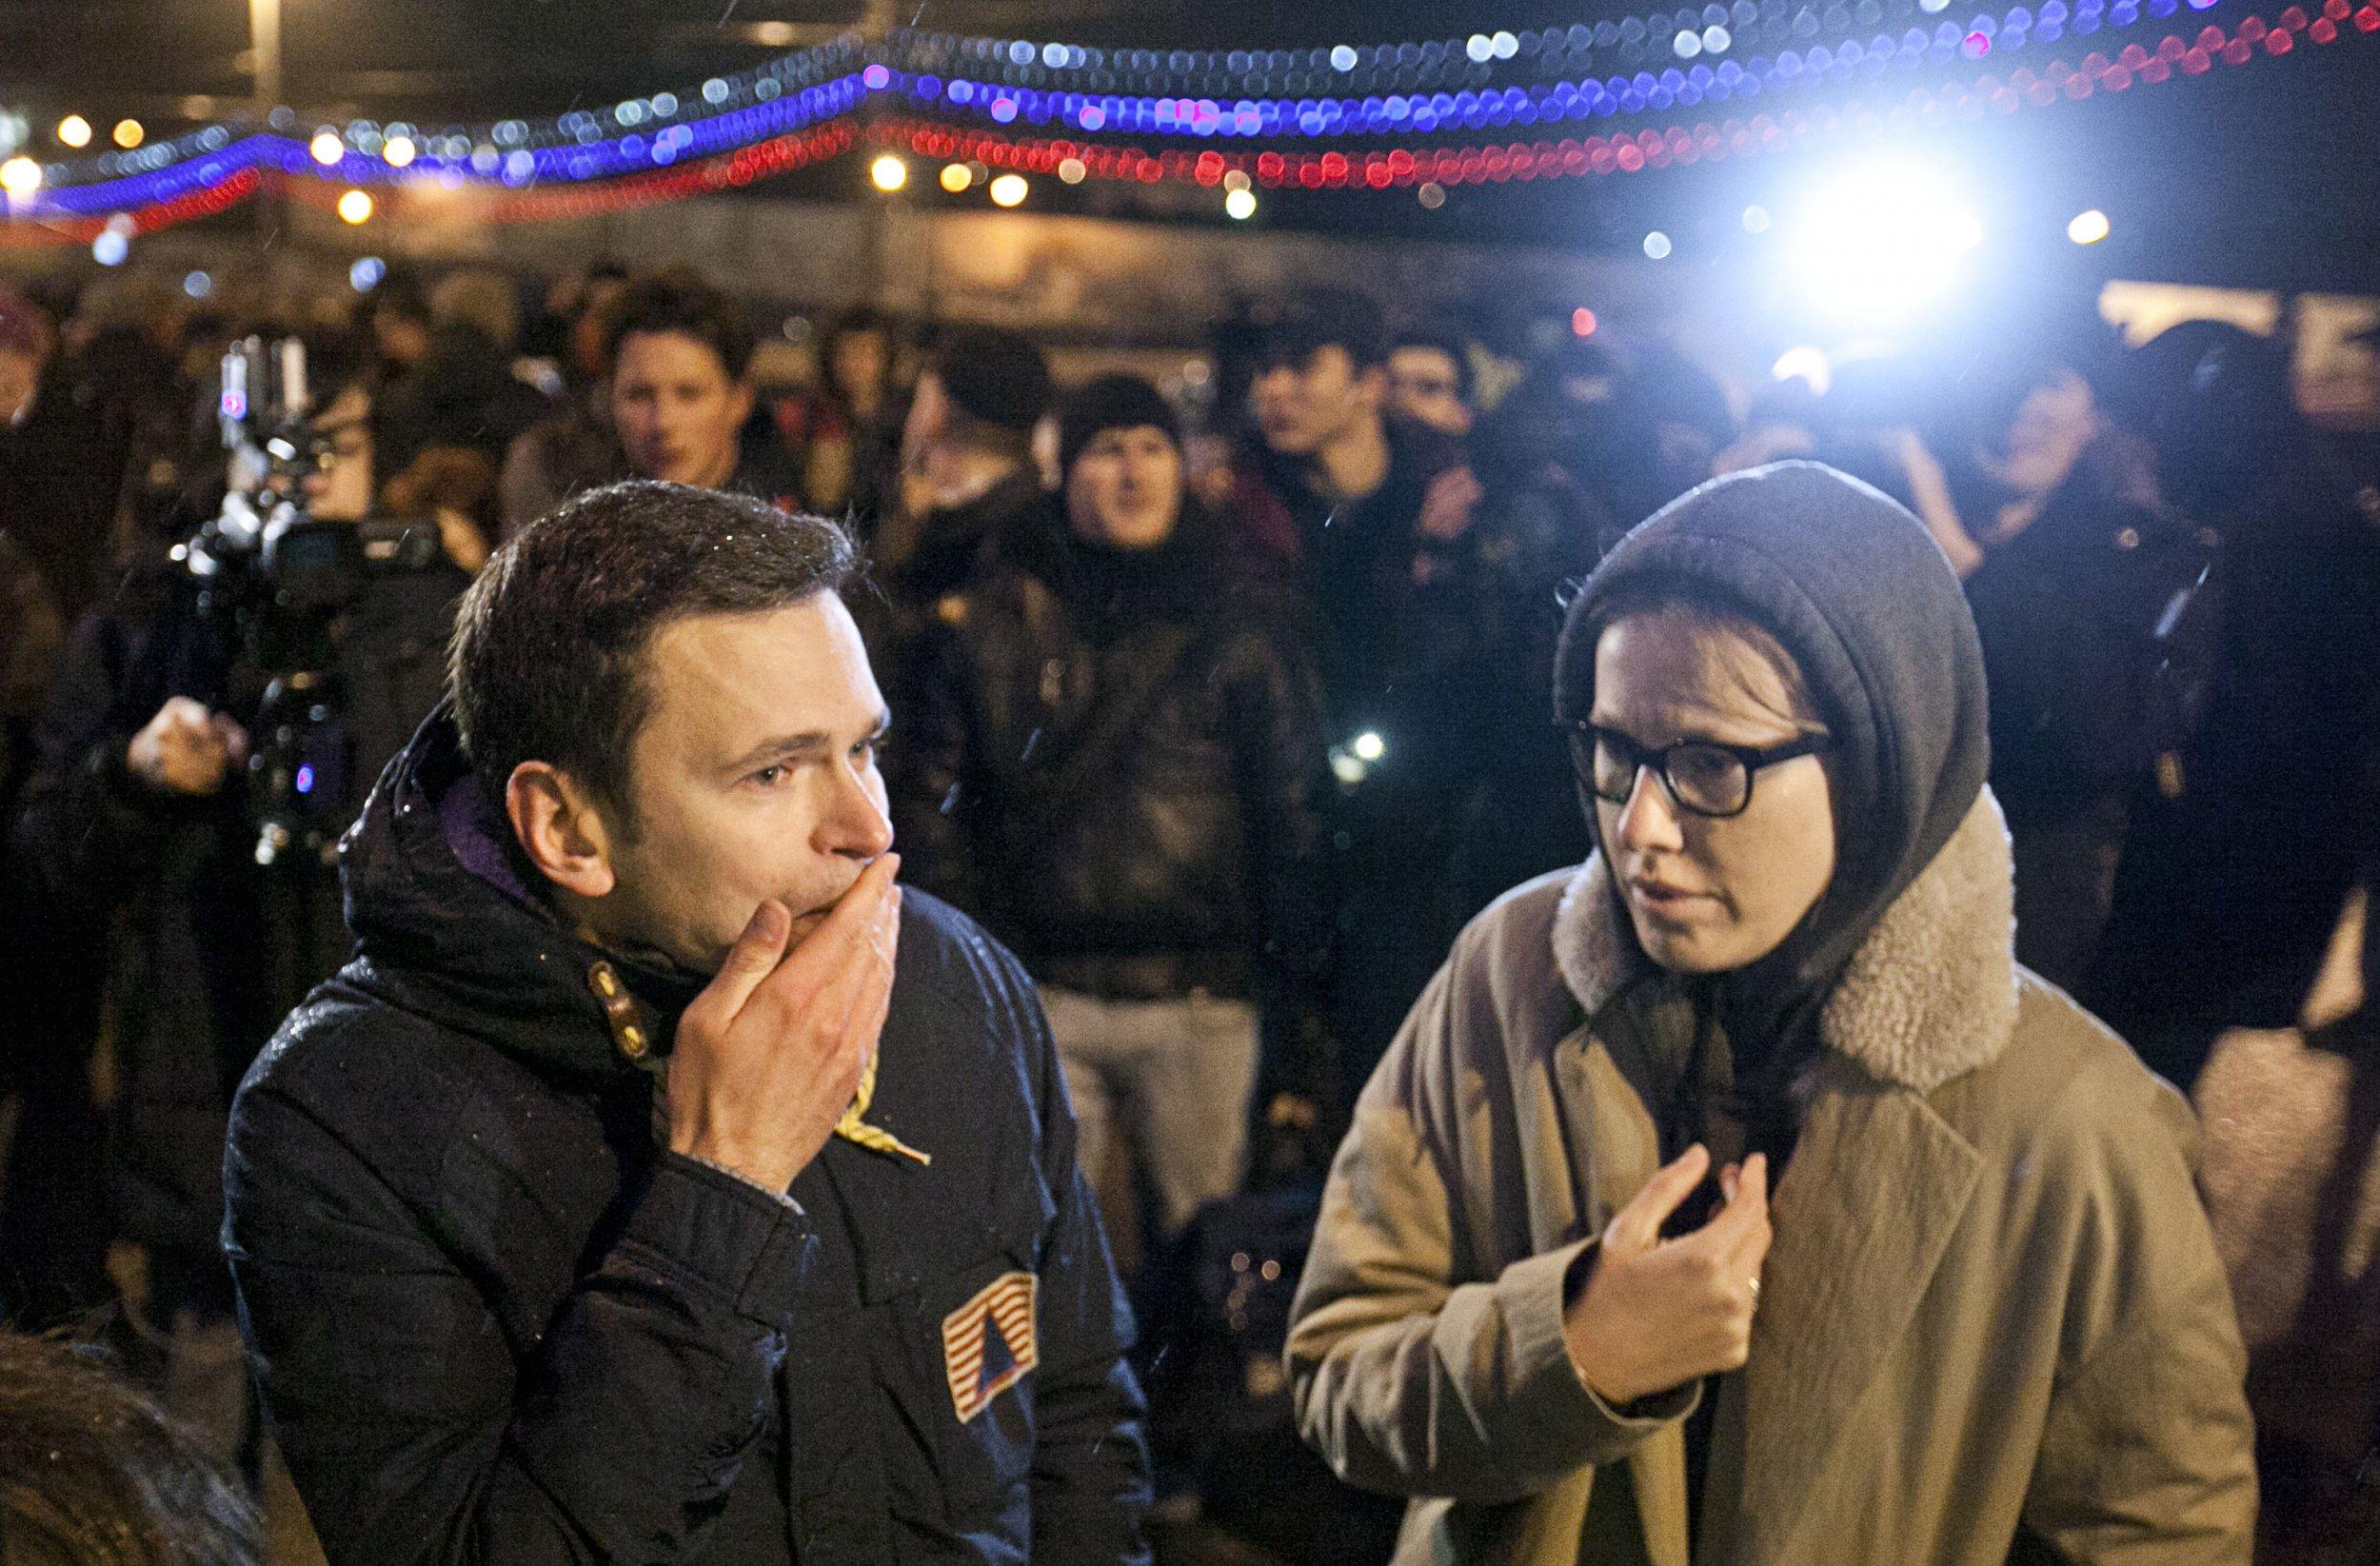 Sobchak and Yashin nominated for Couple of years 06/09/2012 12